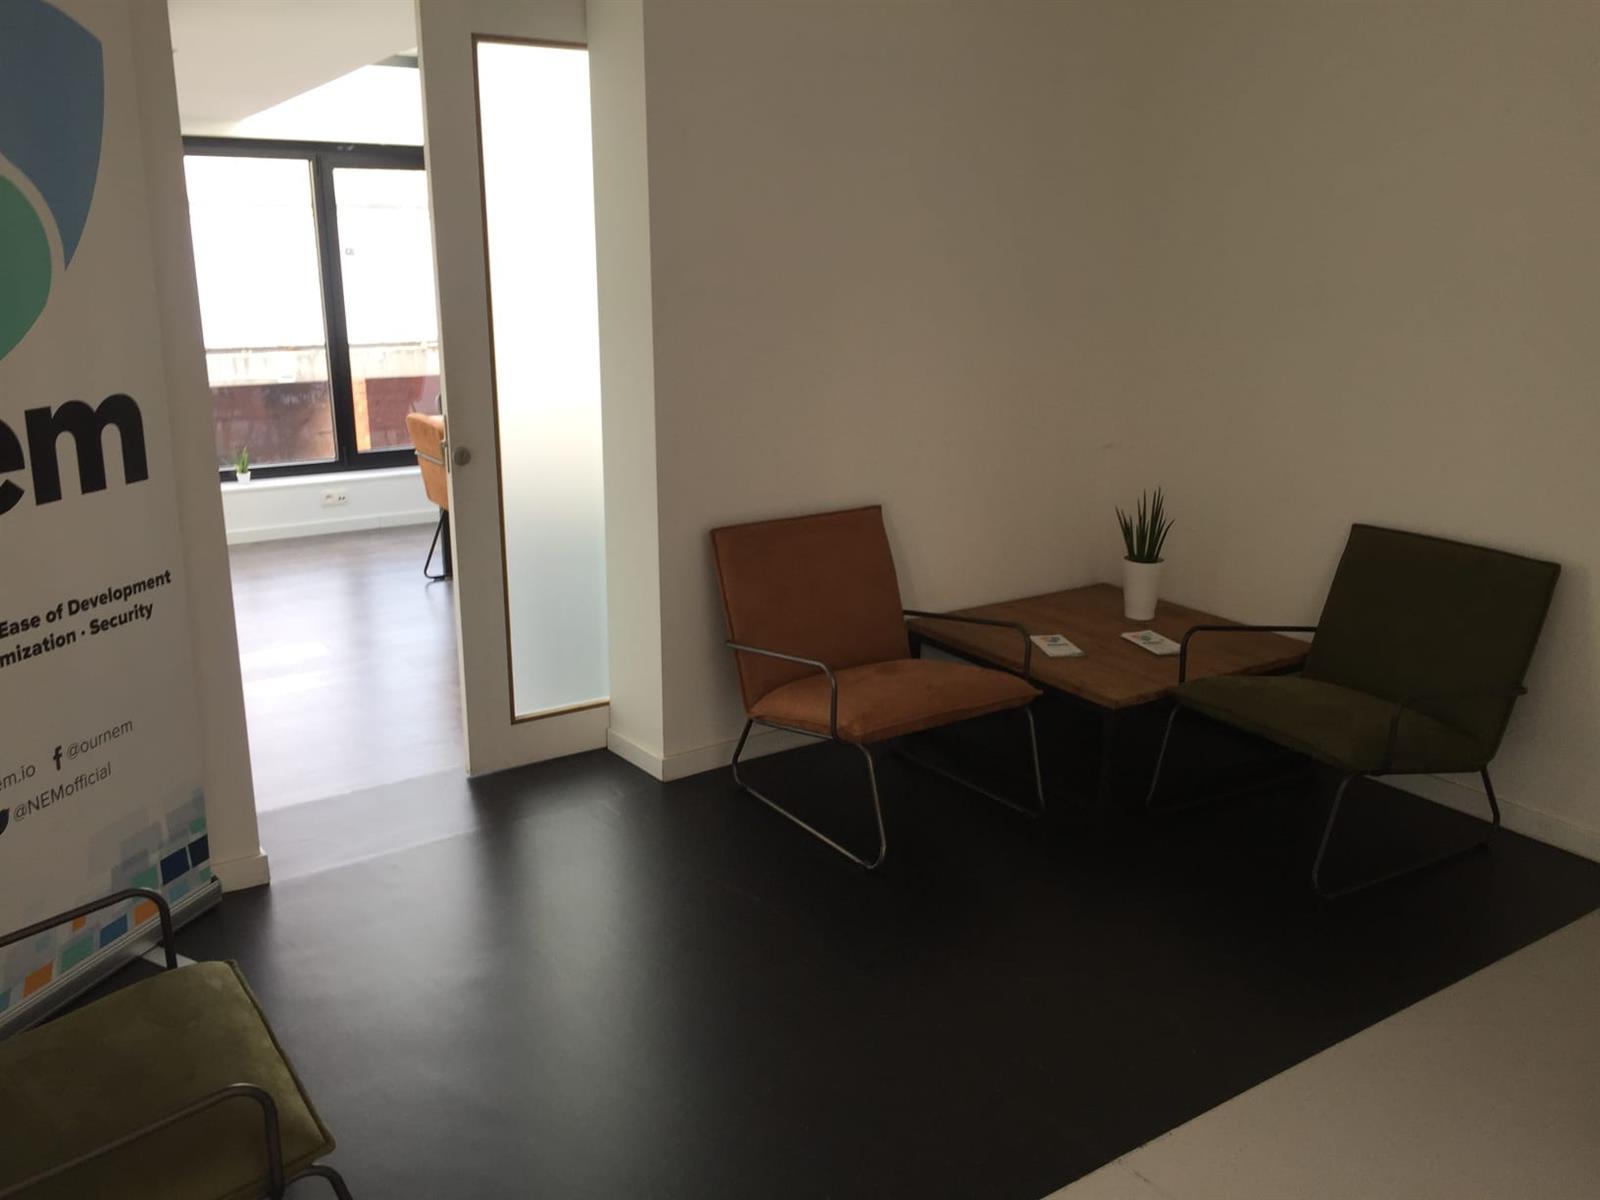 kantoor te huur K003 - Middelmolenlaan 96, 2100 Antwerpen Deurne, België 15